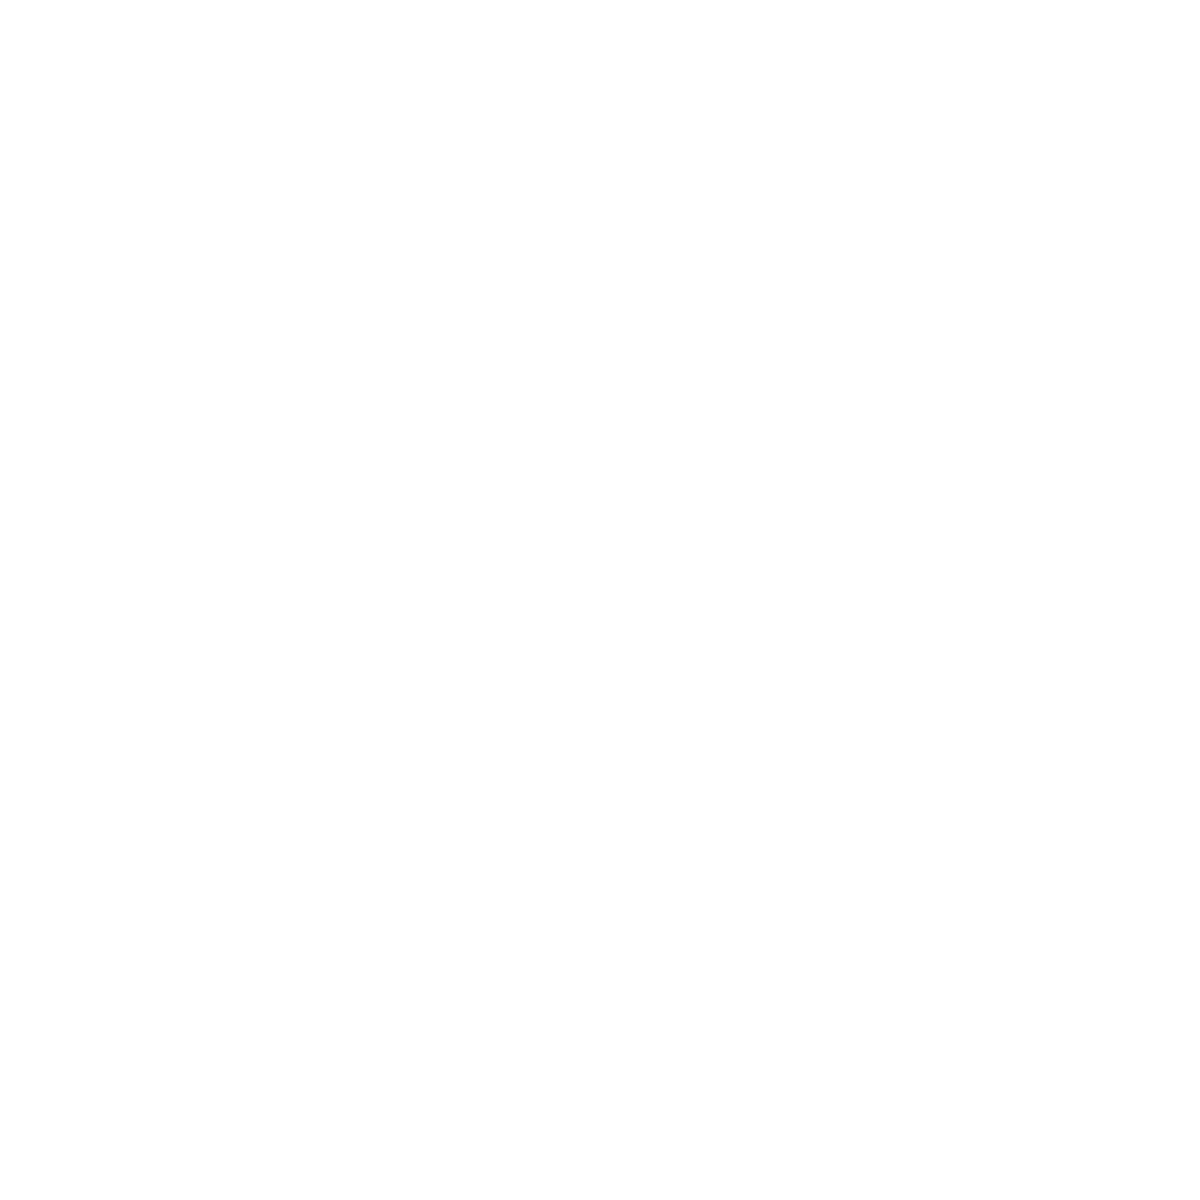 certification logo 4